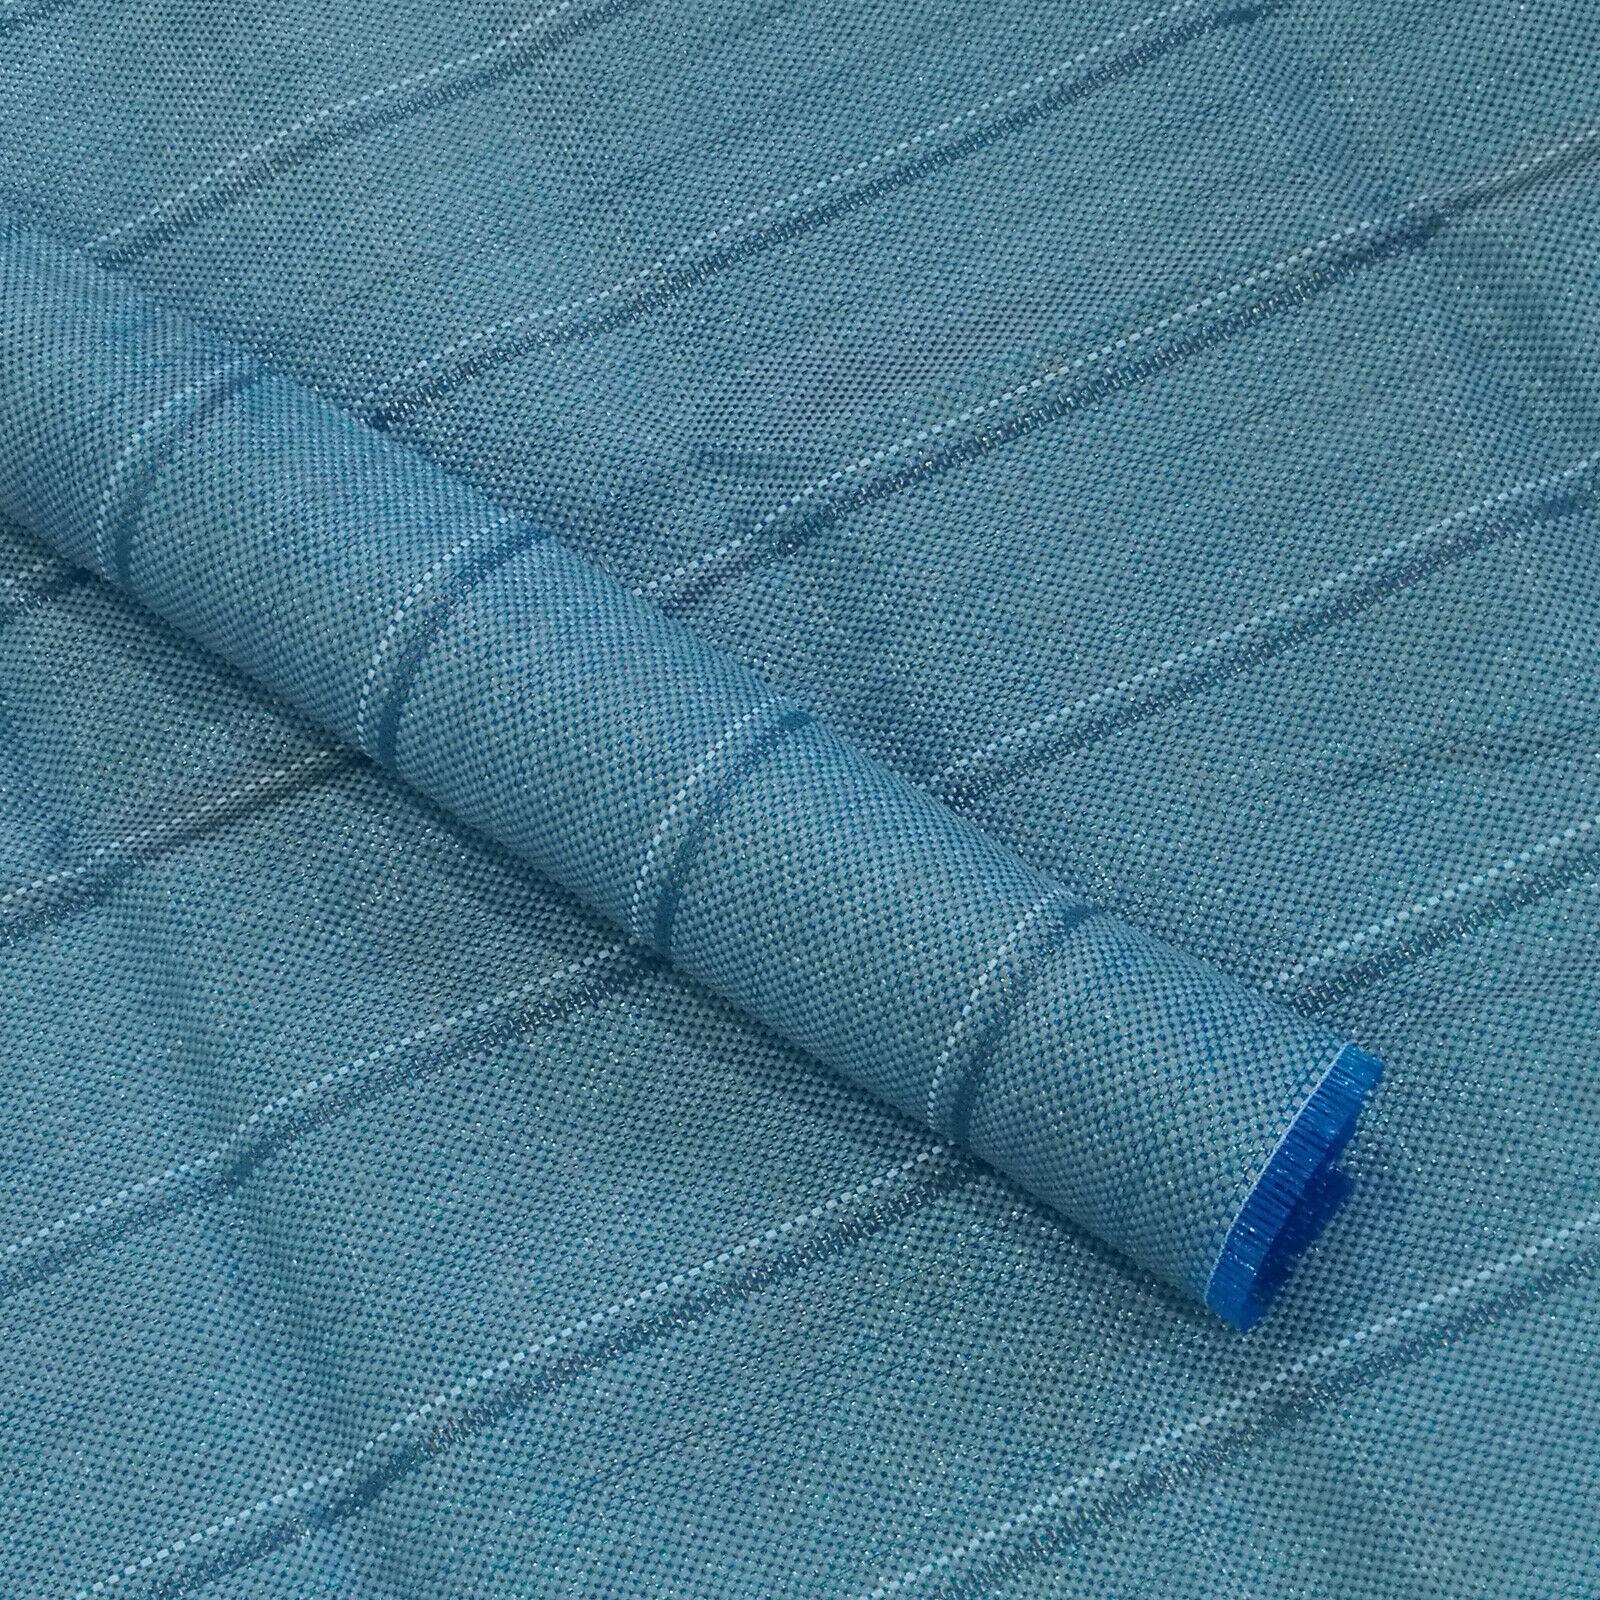 Hell-Blau Hell-Blau Hell-Blau Zeltteppich Vorzeltteppich Campingteppich Zeltboden Vorzelt Camping 4bae56